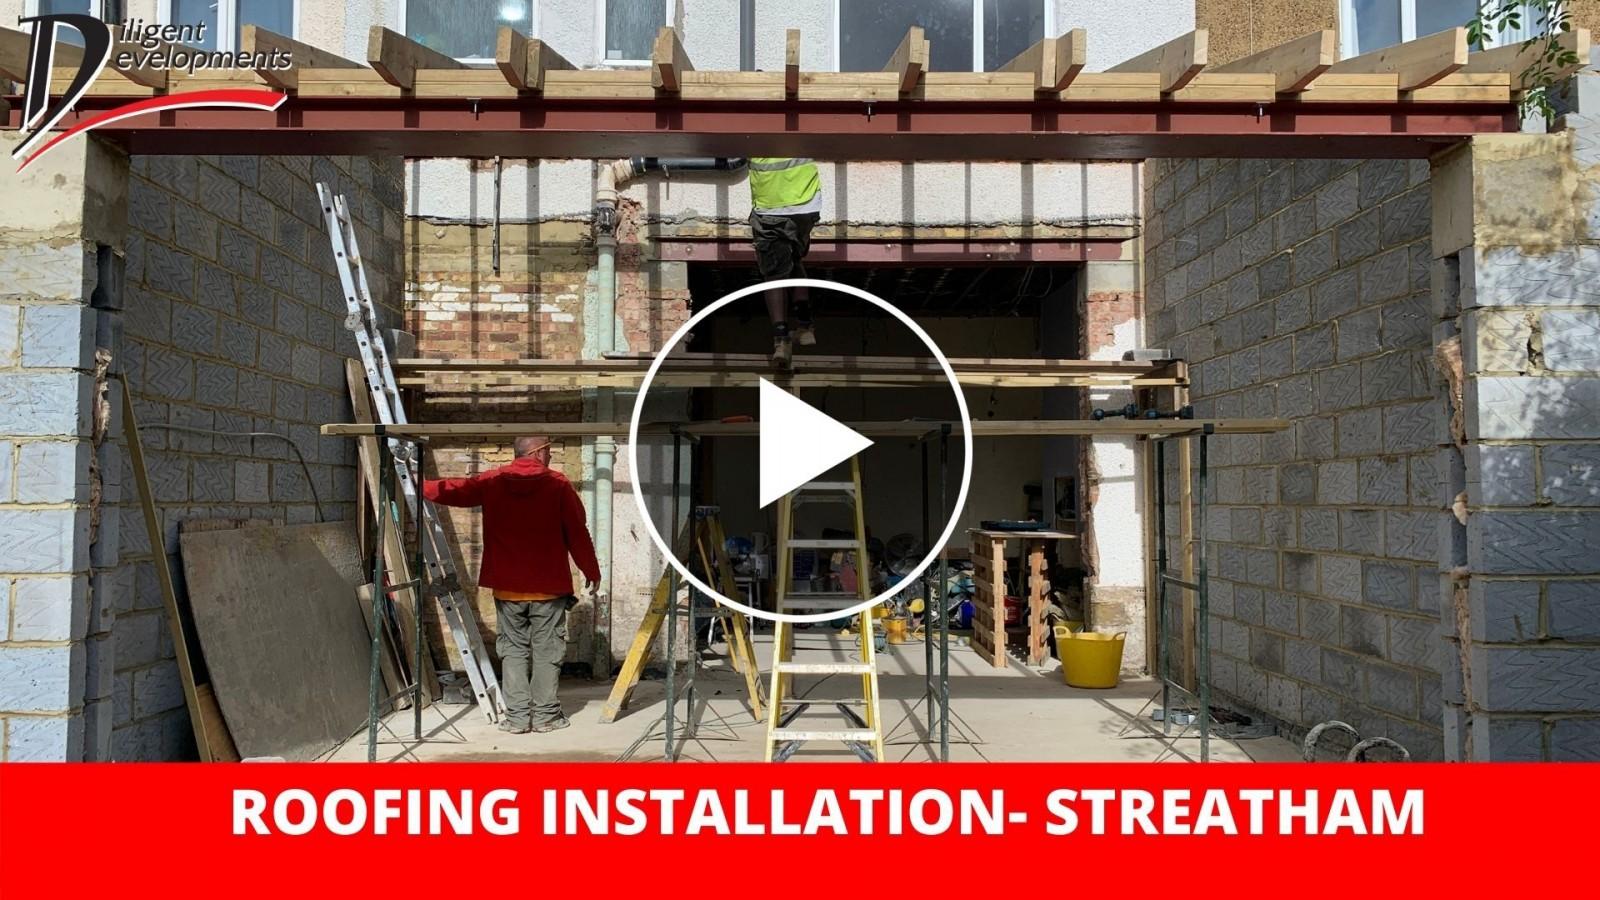 Roofing Installation - Streatham